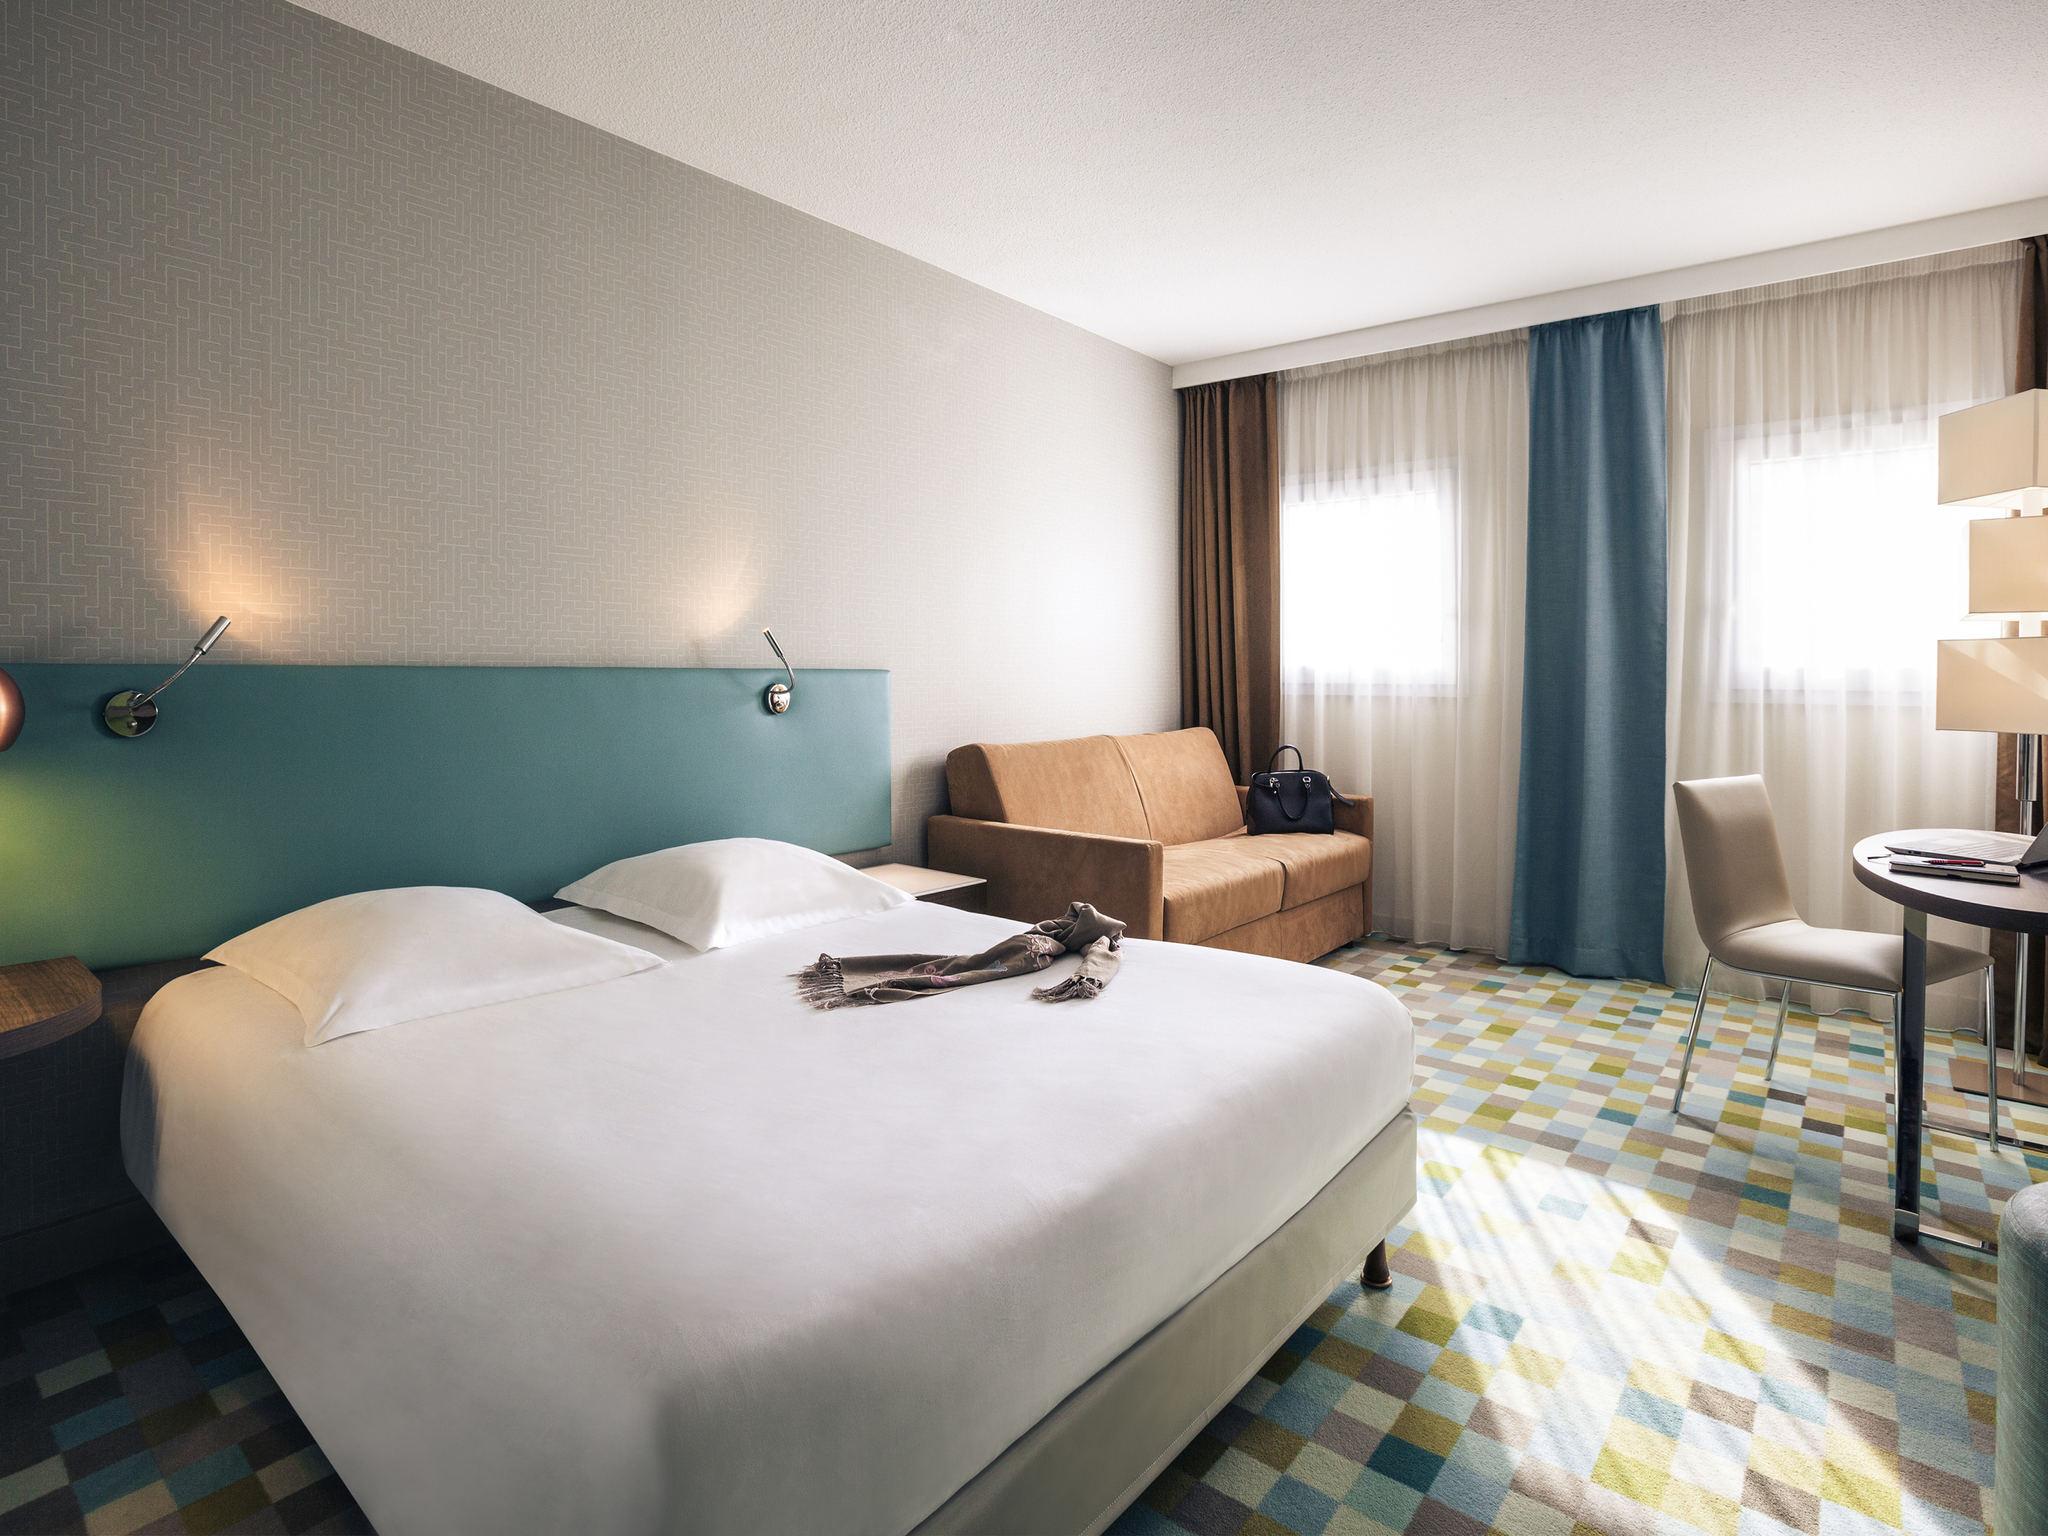 Hotel – Hôtel Mercure Marne-la-Vallée Bussy-Saint-Georges